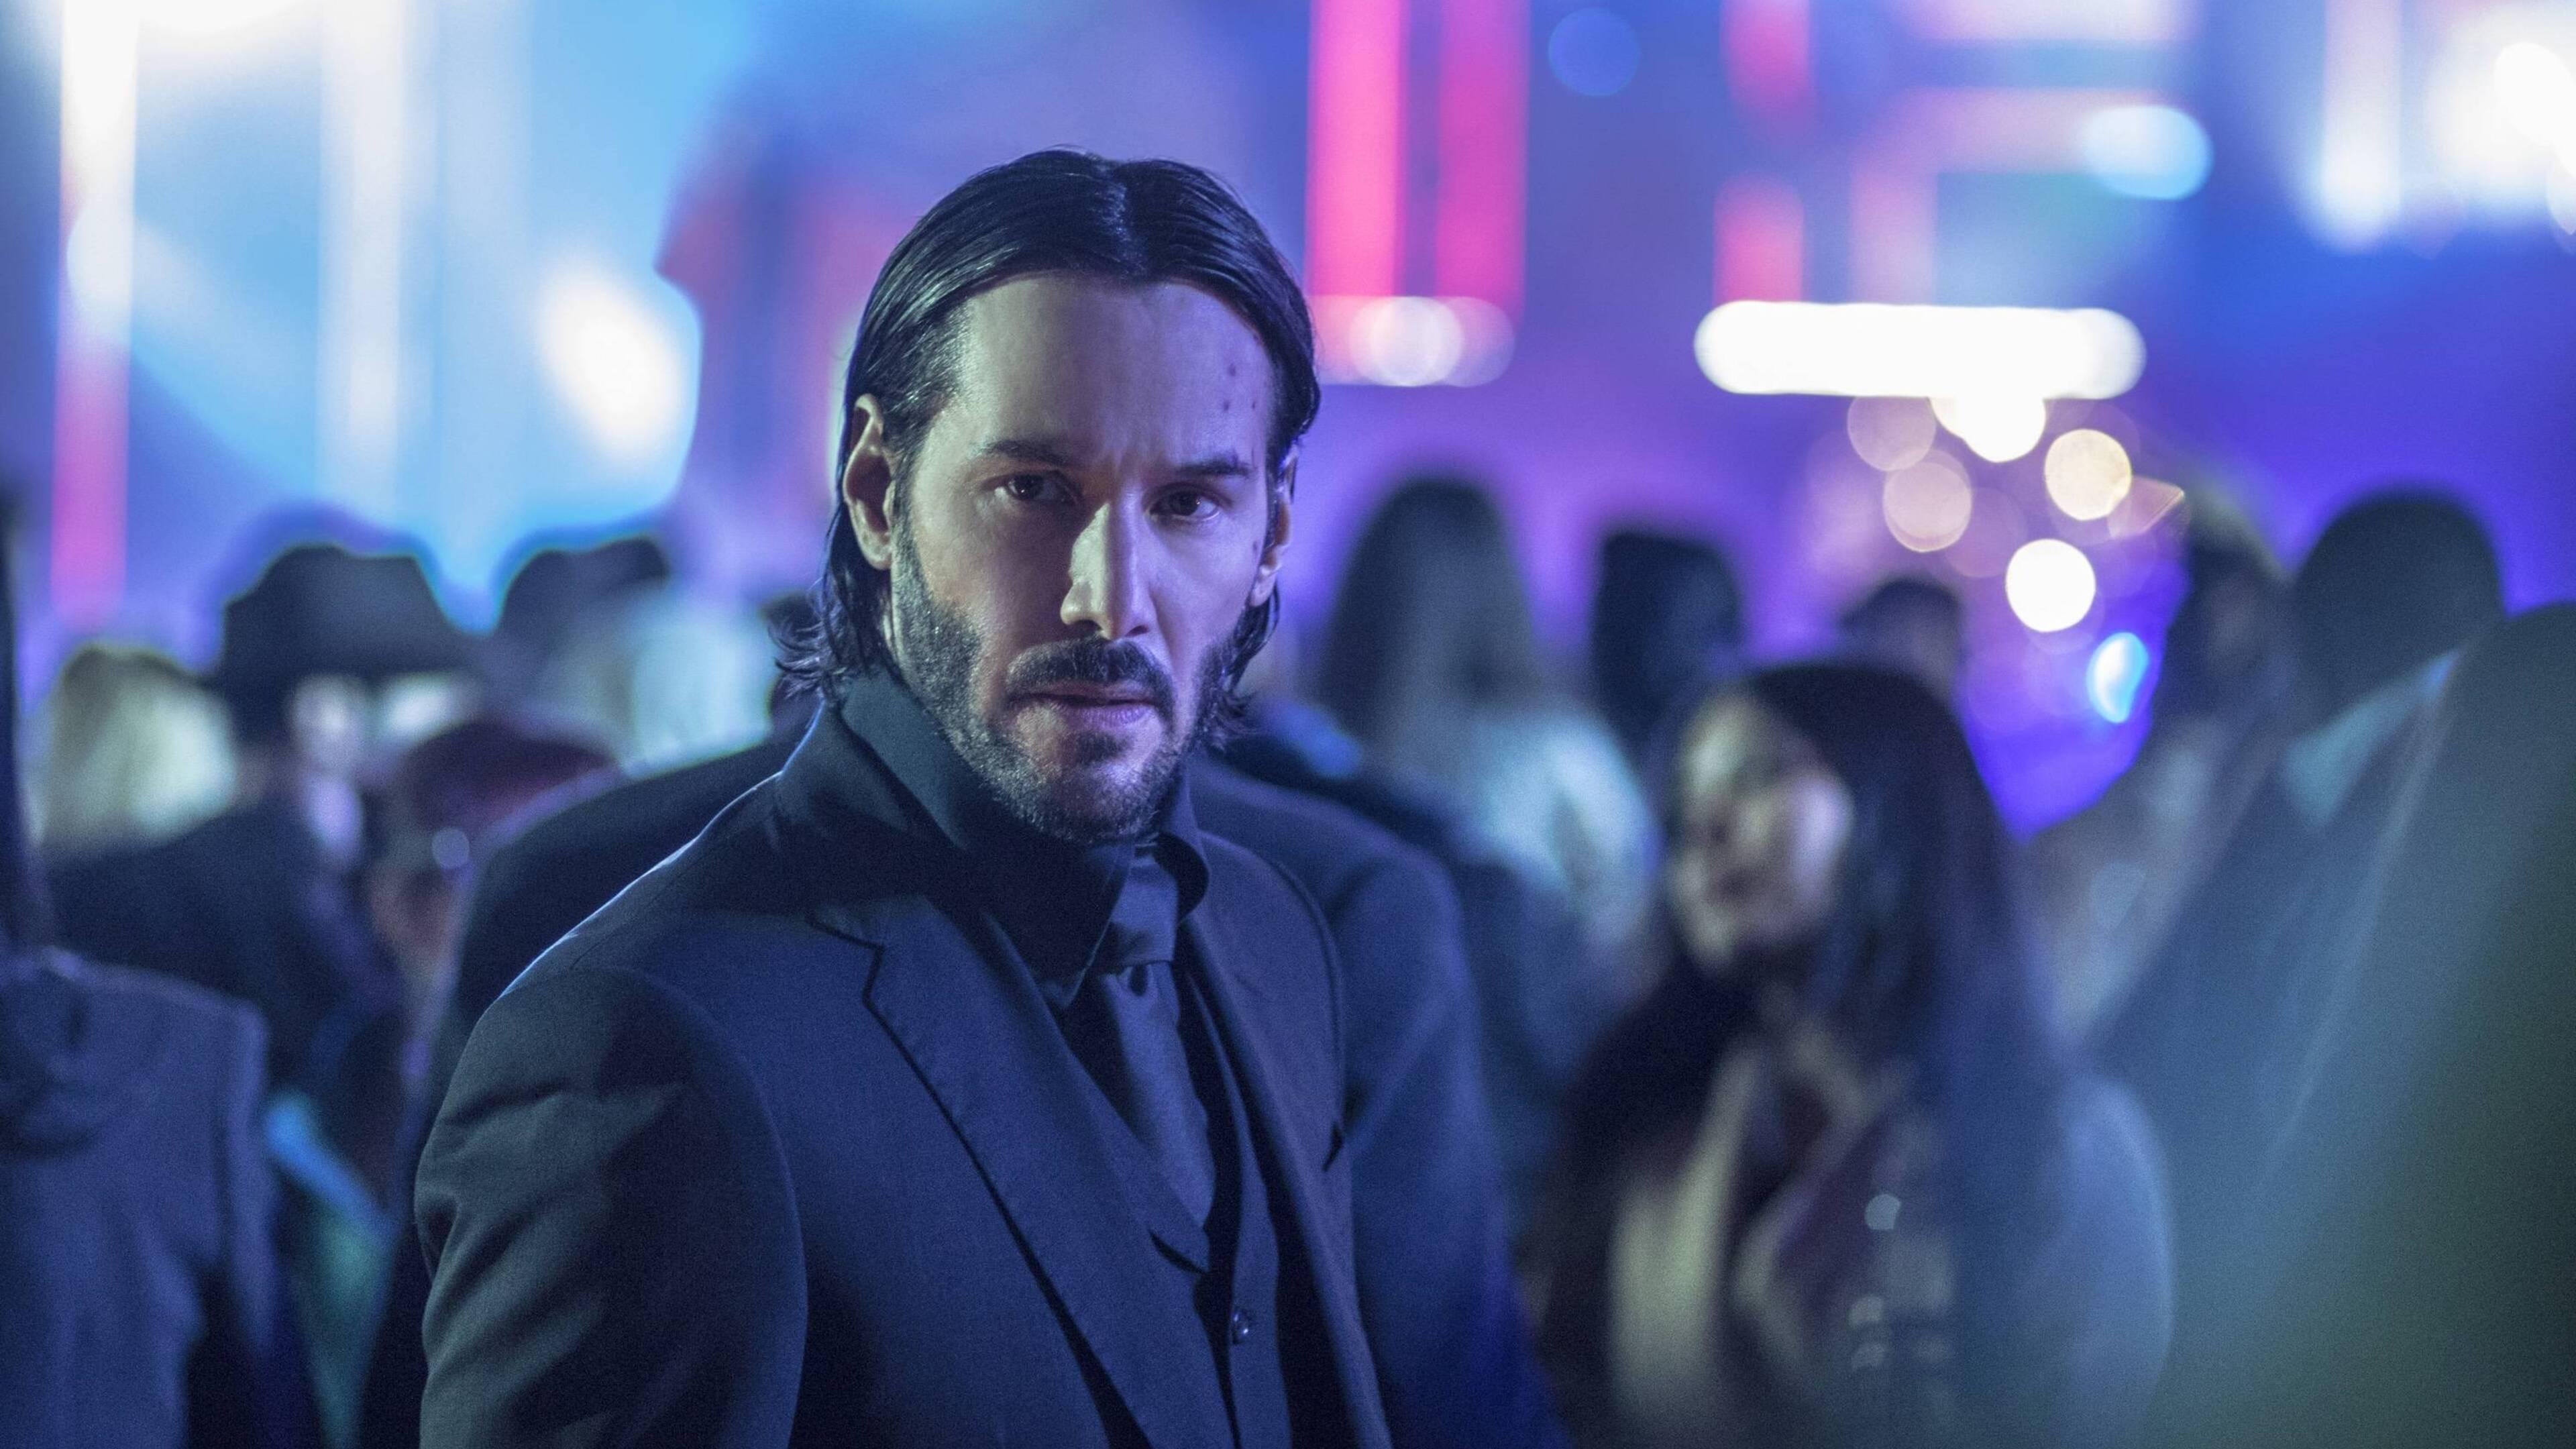 3840x2160 Keanu Reeves In John Wick 2 4k Hd 4k Wallpapers